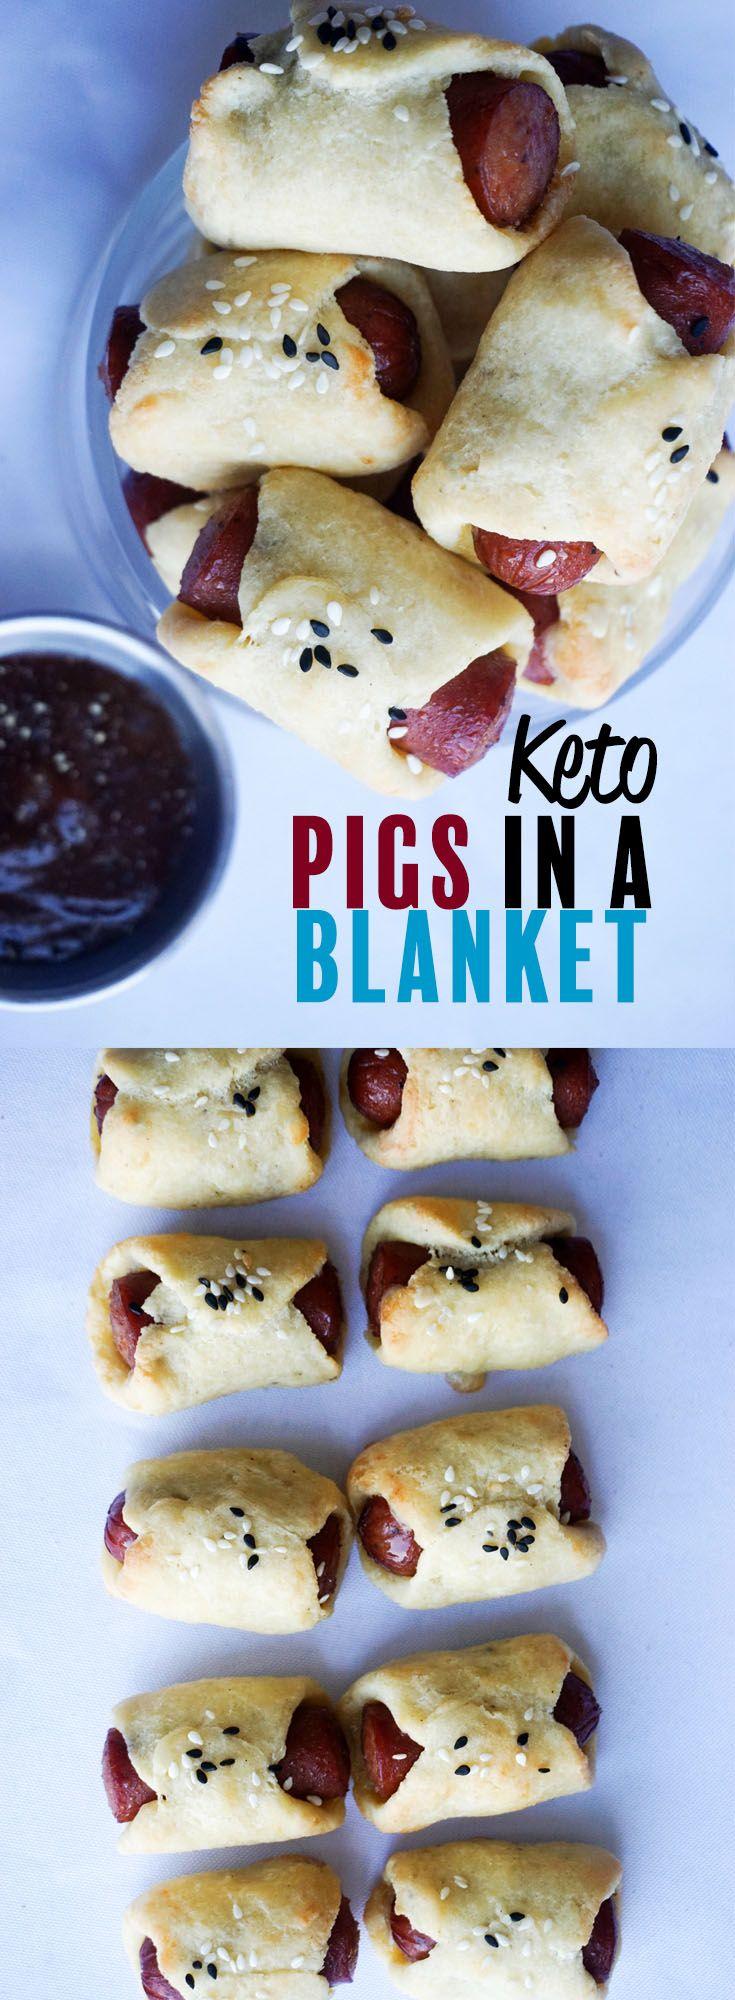 Keto Pigs in a Blanket! Kid friendly keto recipe. Big kids too :)